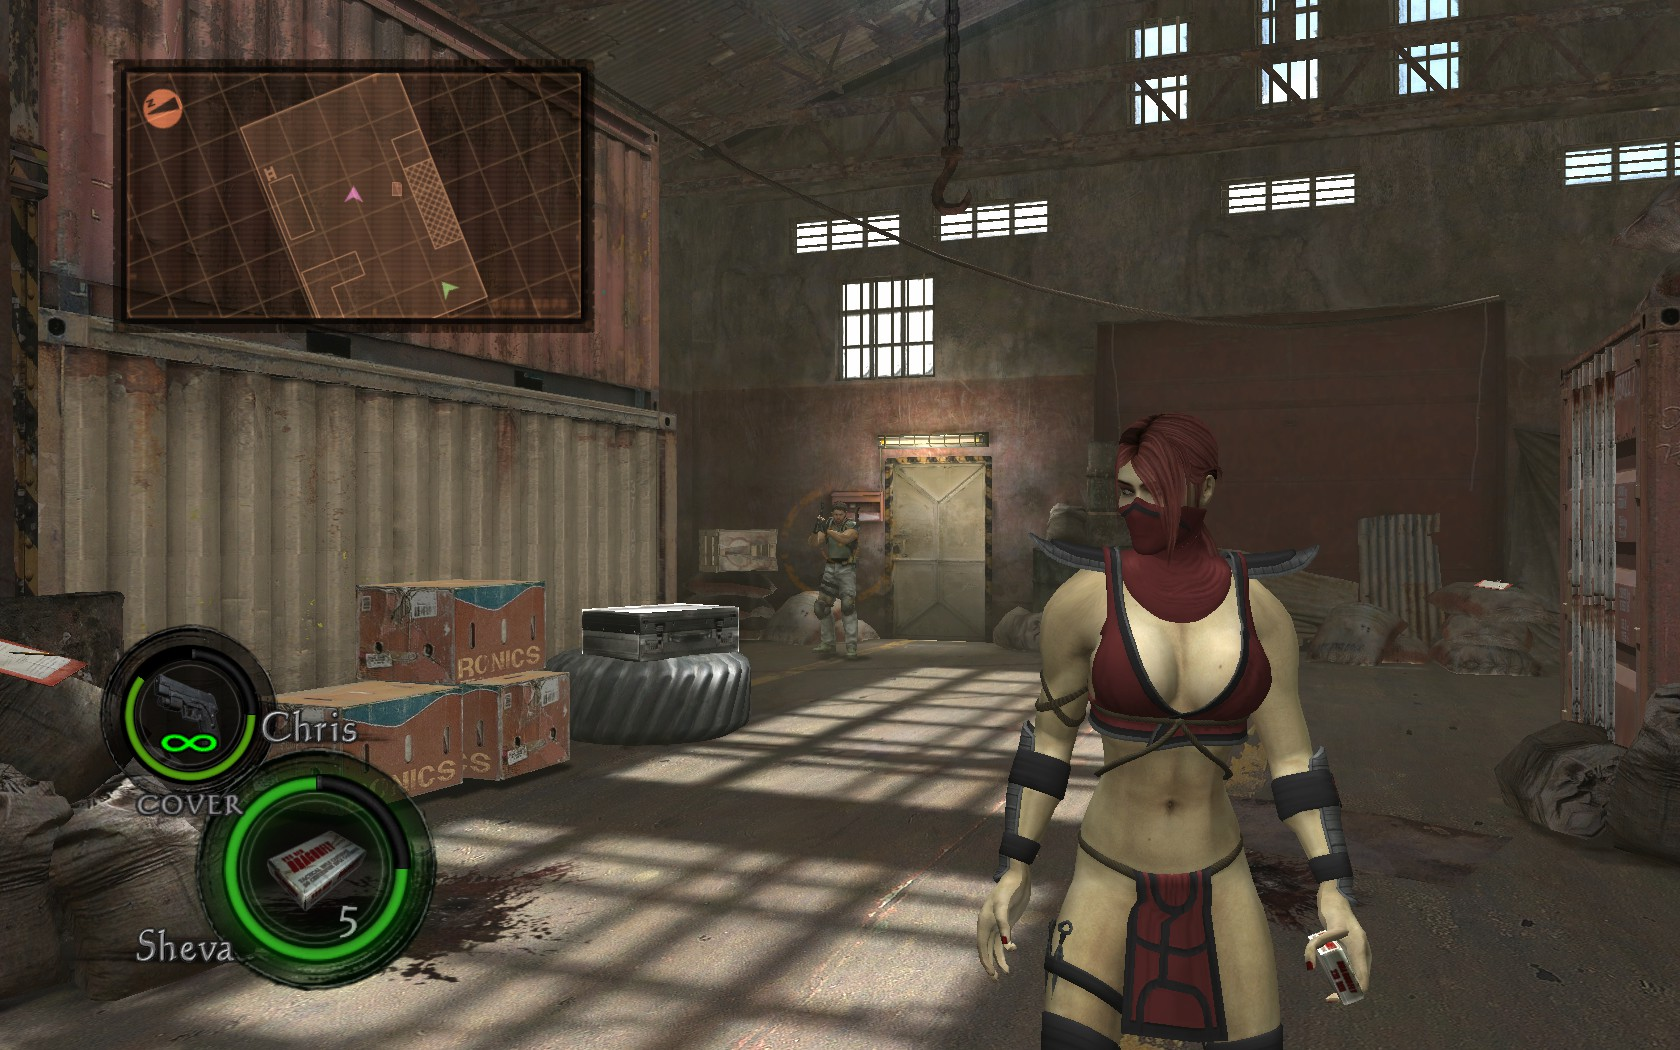 Resident evil 5 sheva cloning mods smut clip